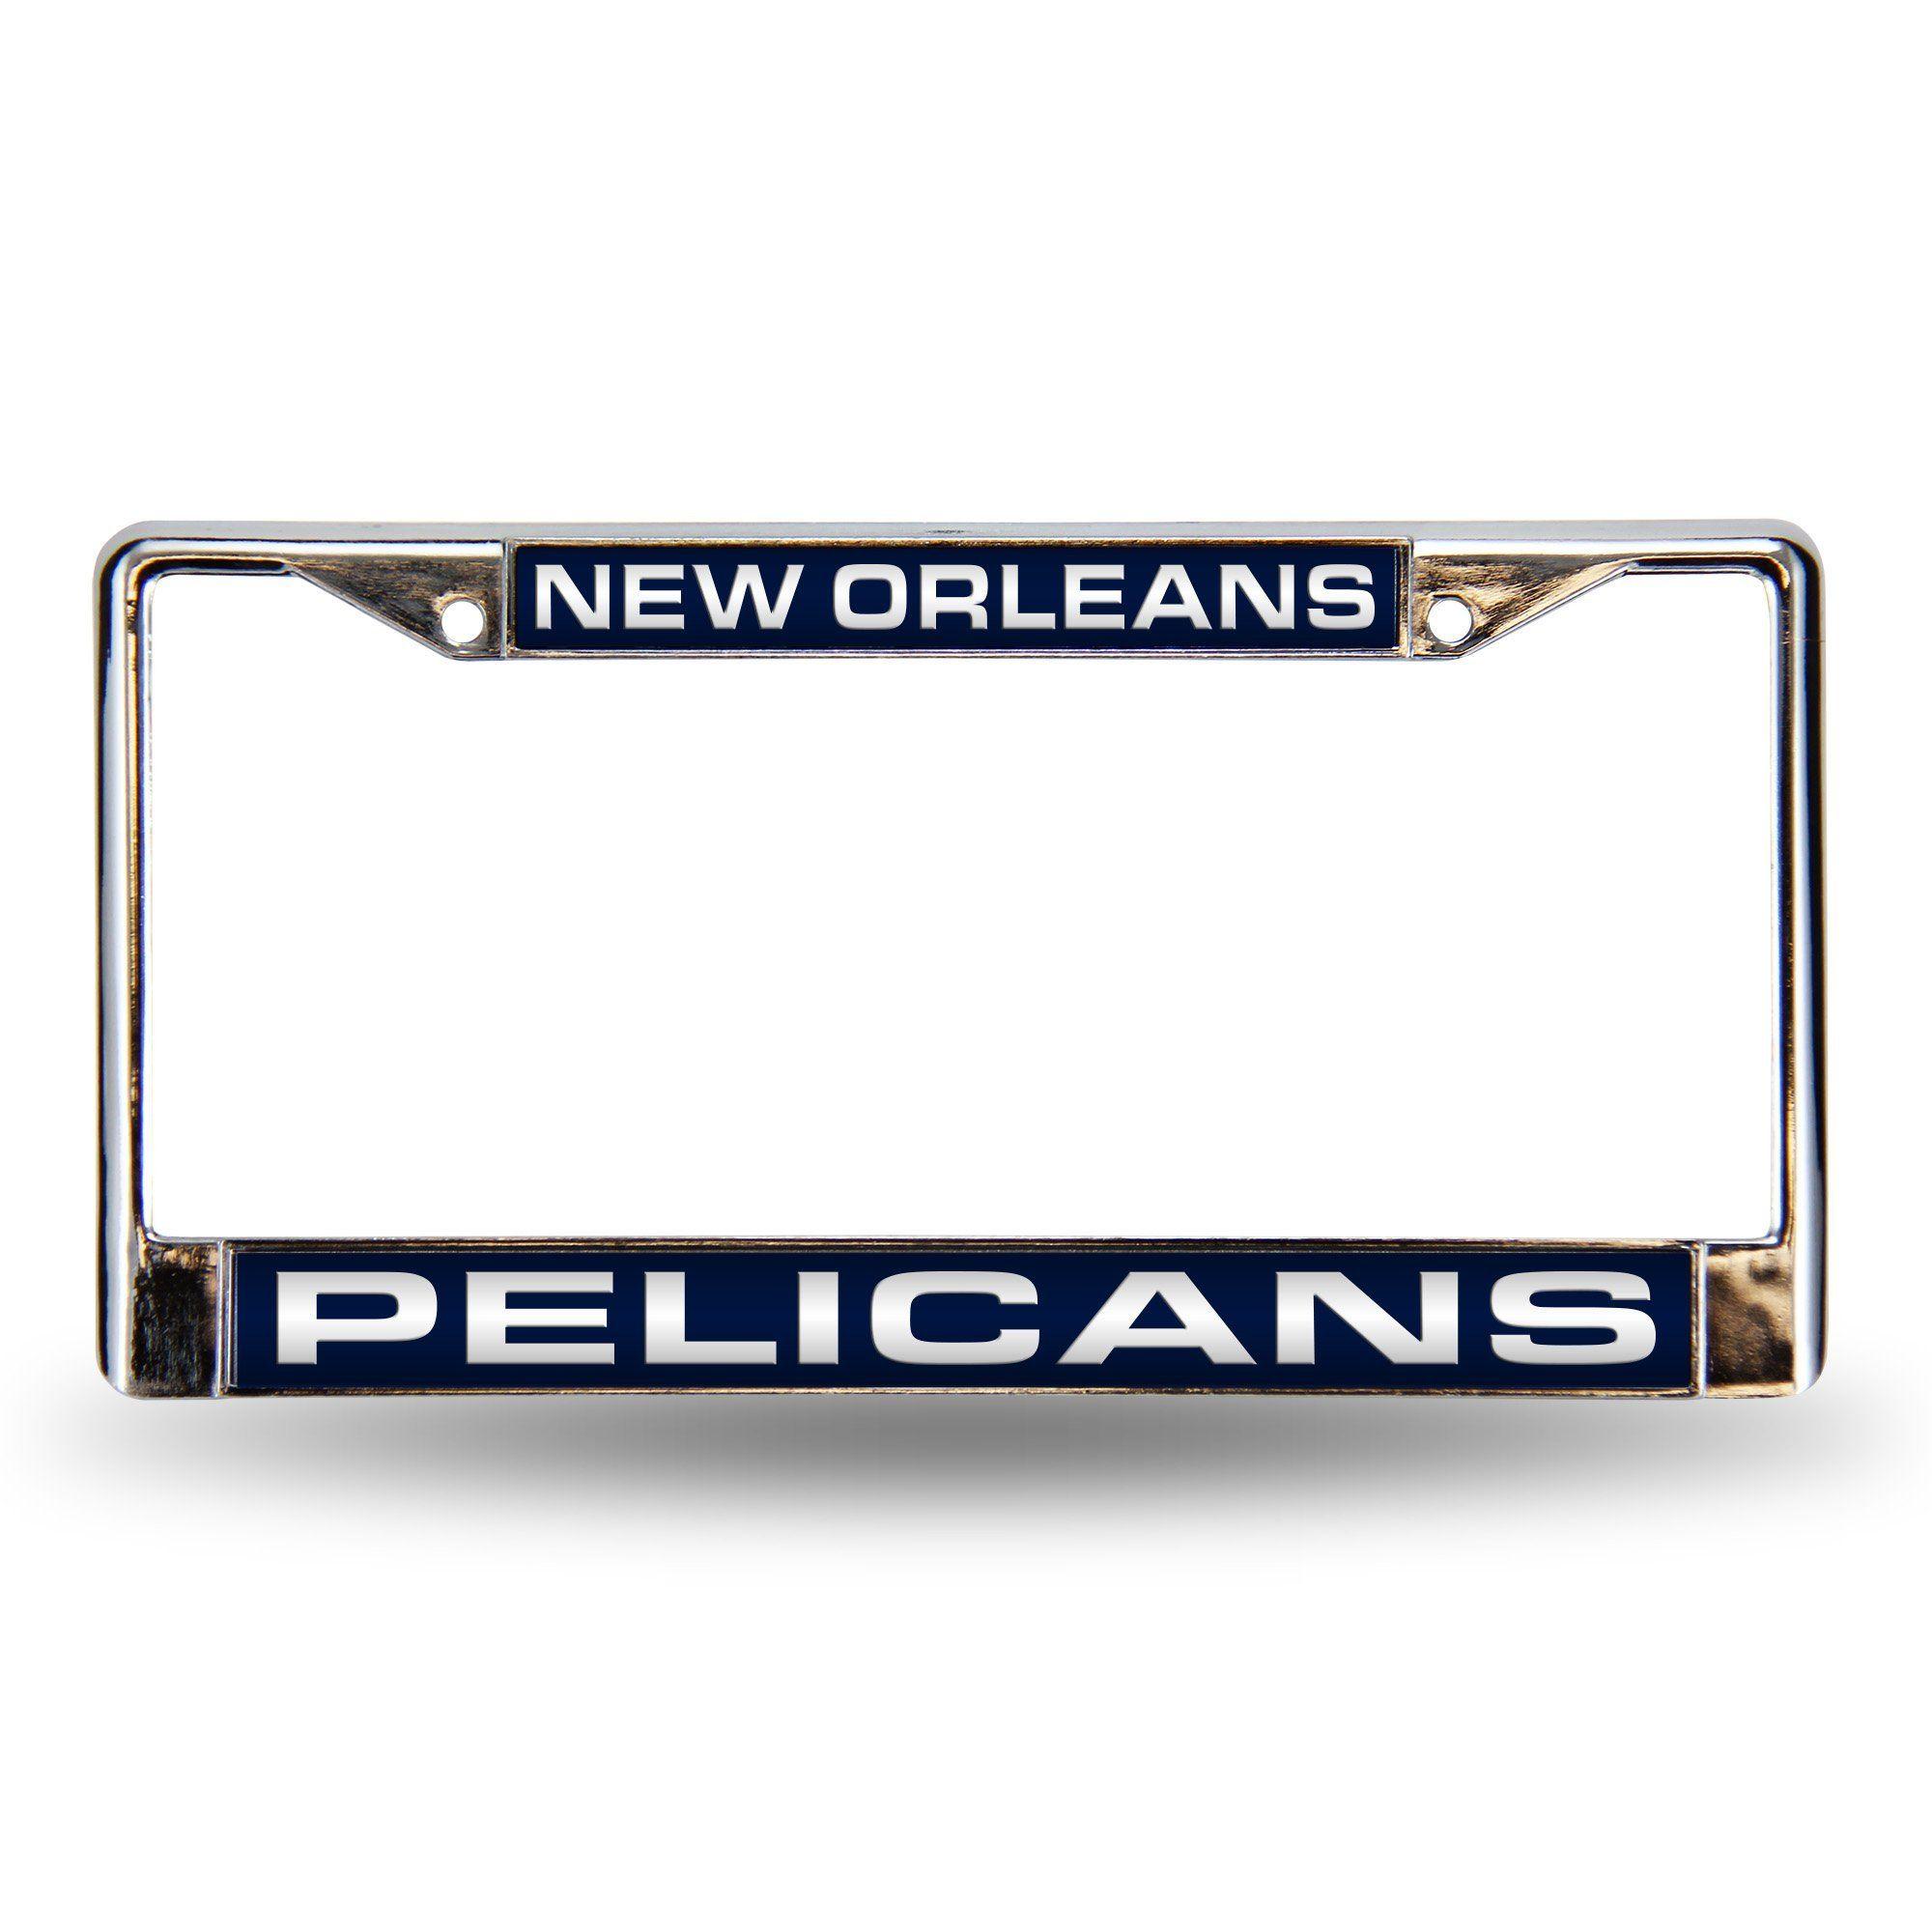 New Orleans Pelicans Laser Chrome Frame License Plate